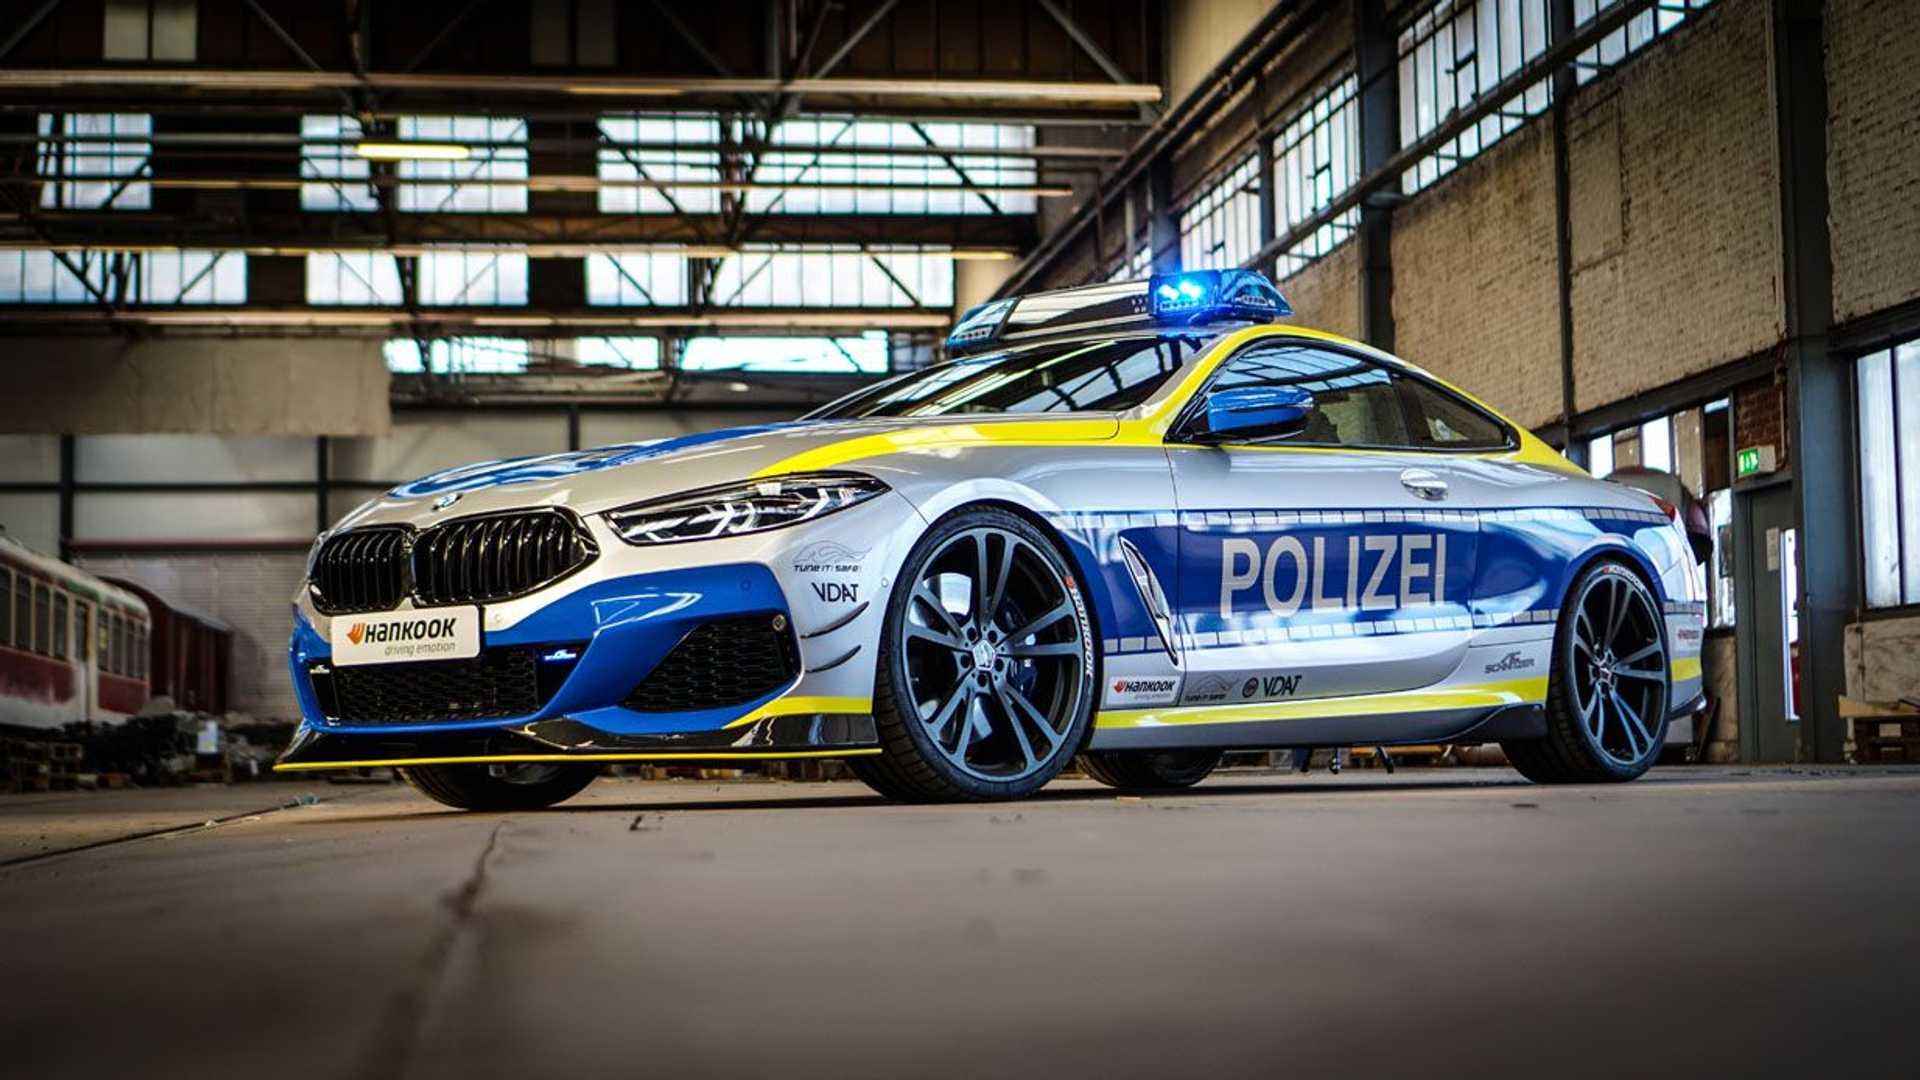 BMW-M850i-police-car-tune-it-safe-19